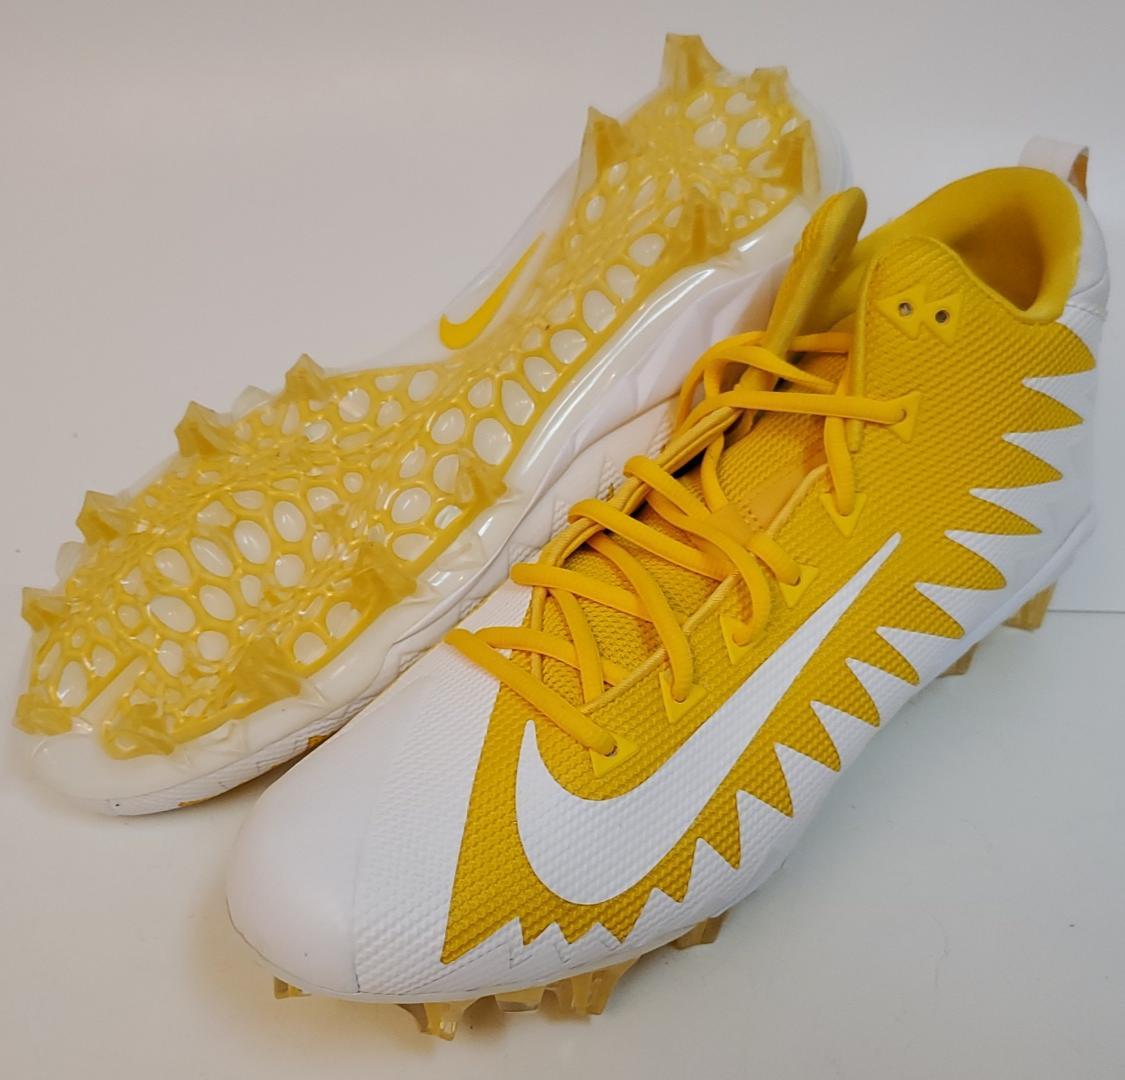 Nike New Alpha Menace YELLOW (US SIZE